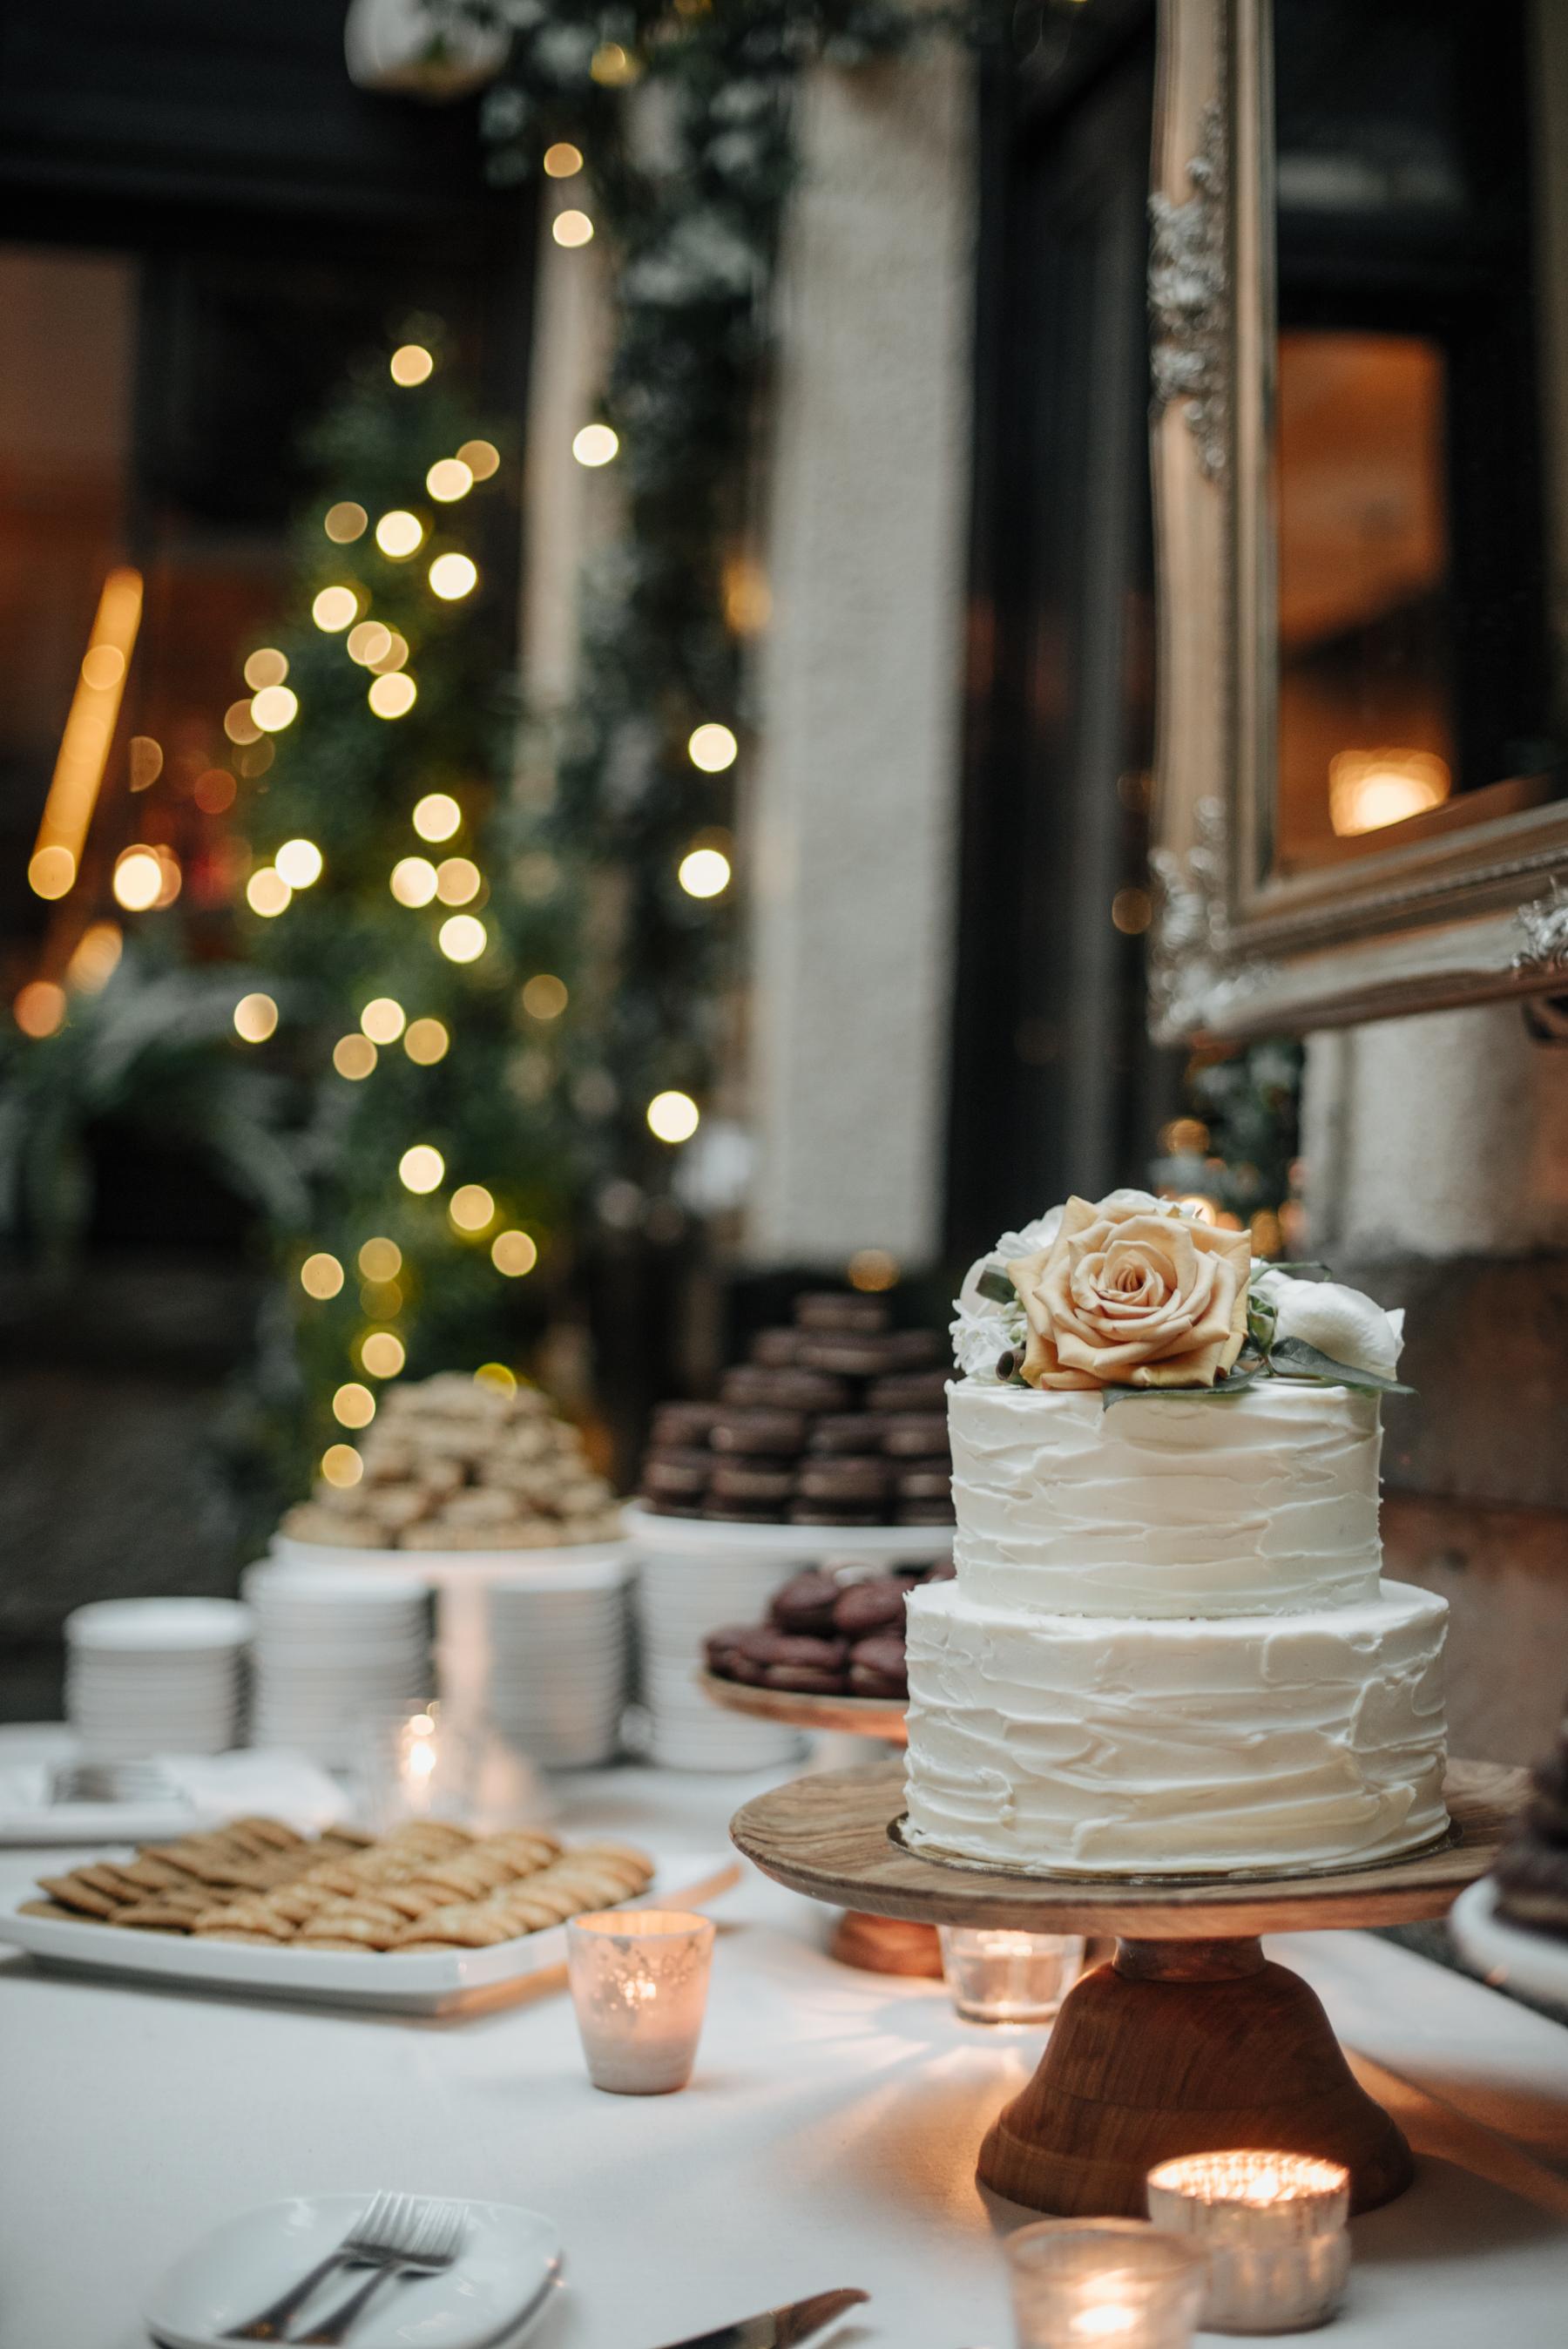 kaoverii_silva_photographer_cynthia_richard_wedding_vancouver_brix_&_mortar-36.jpg